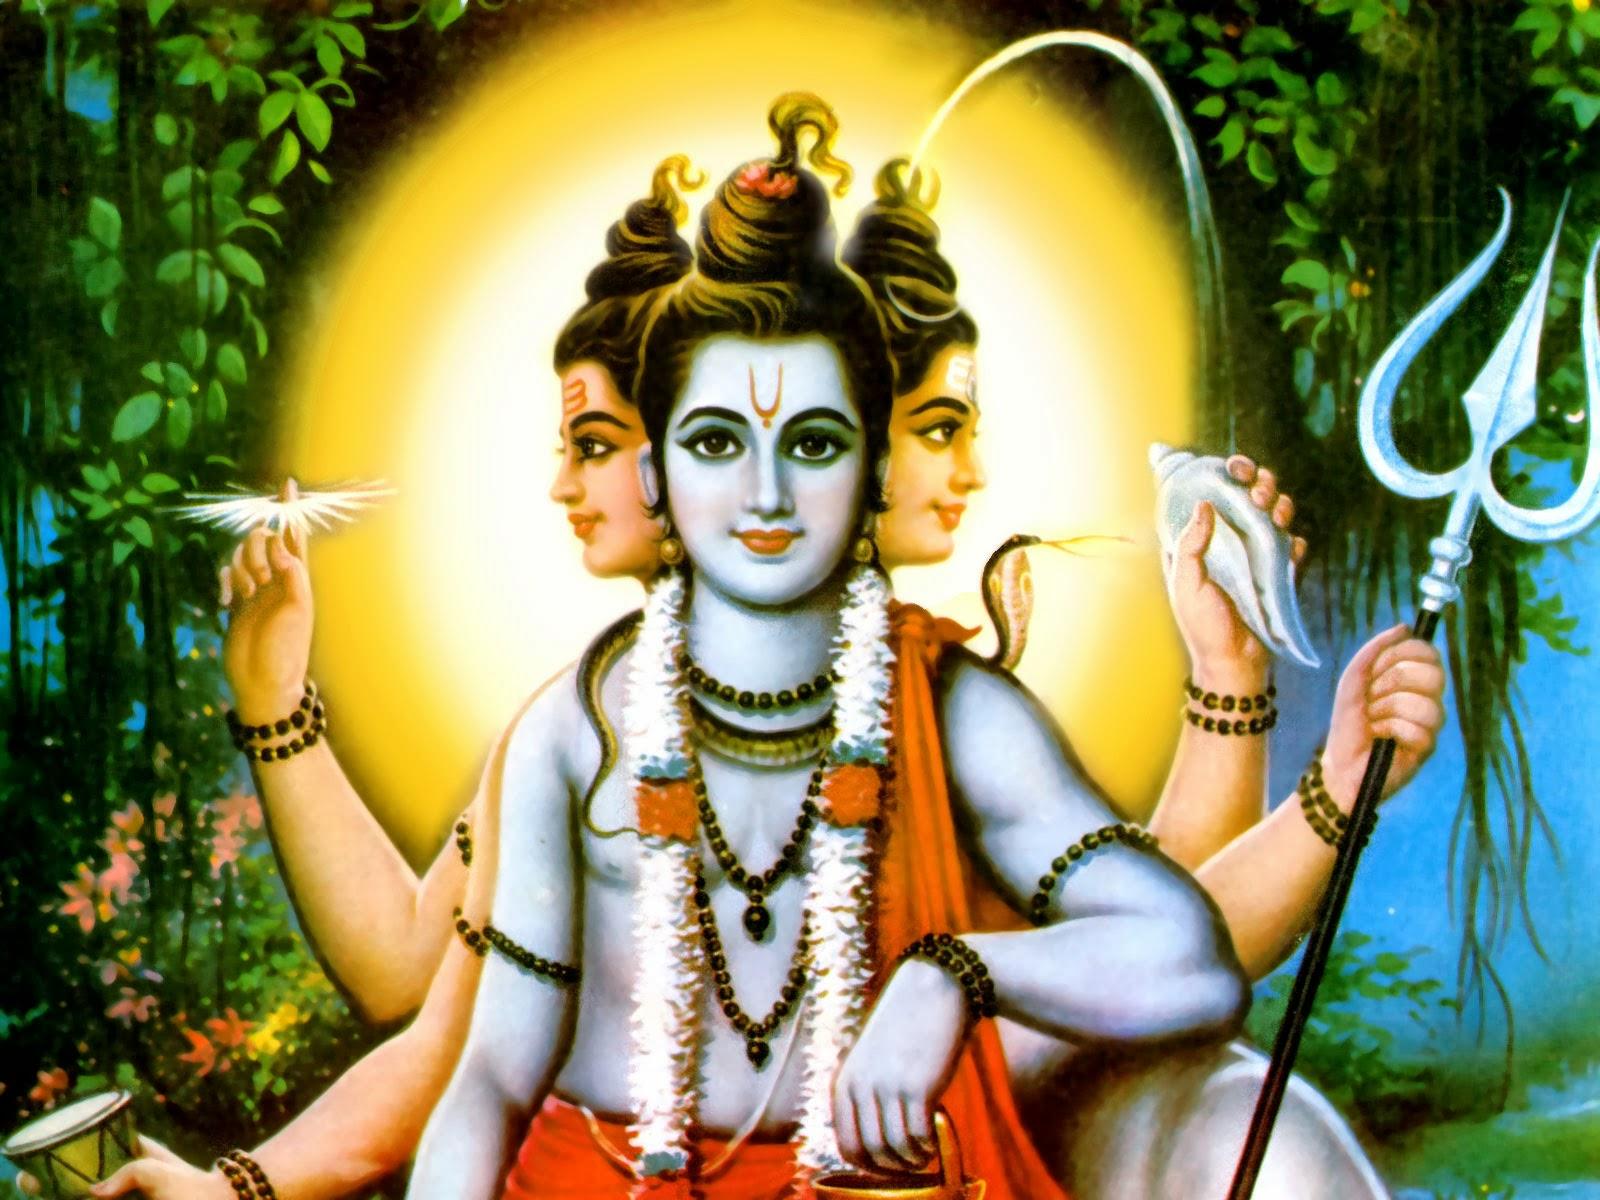 hindu god picture dattatreya hd wallpaper dattatreya wallpaper 1600x1200